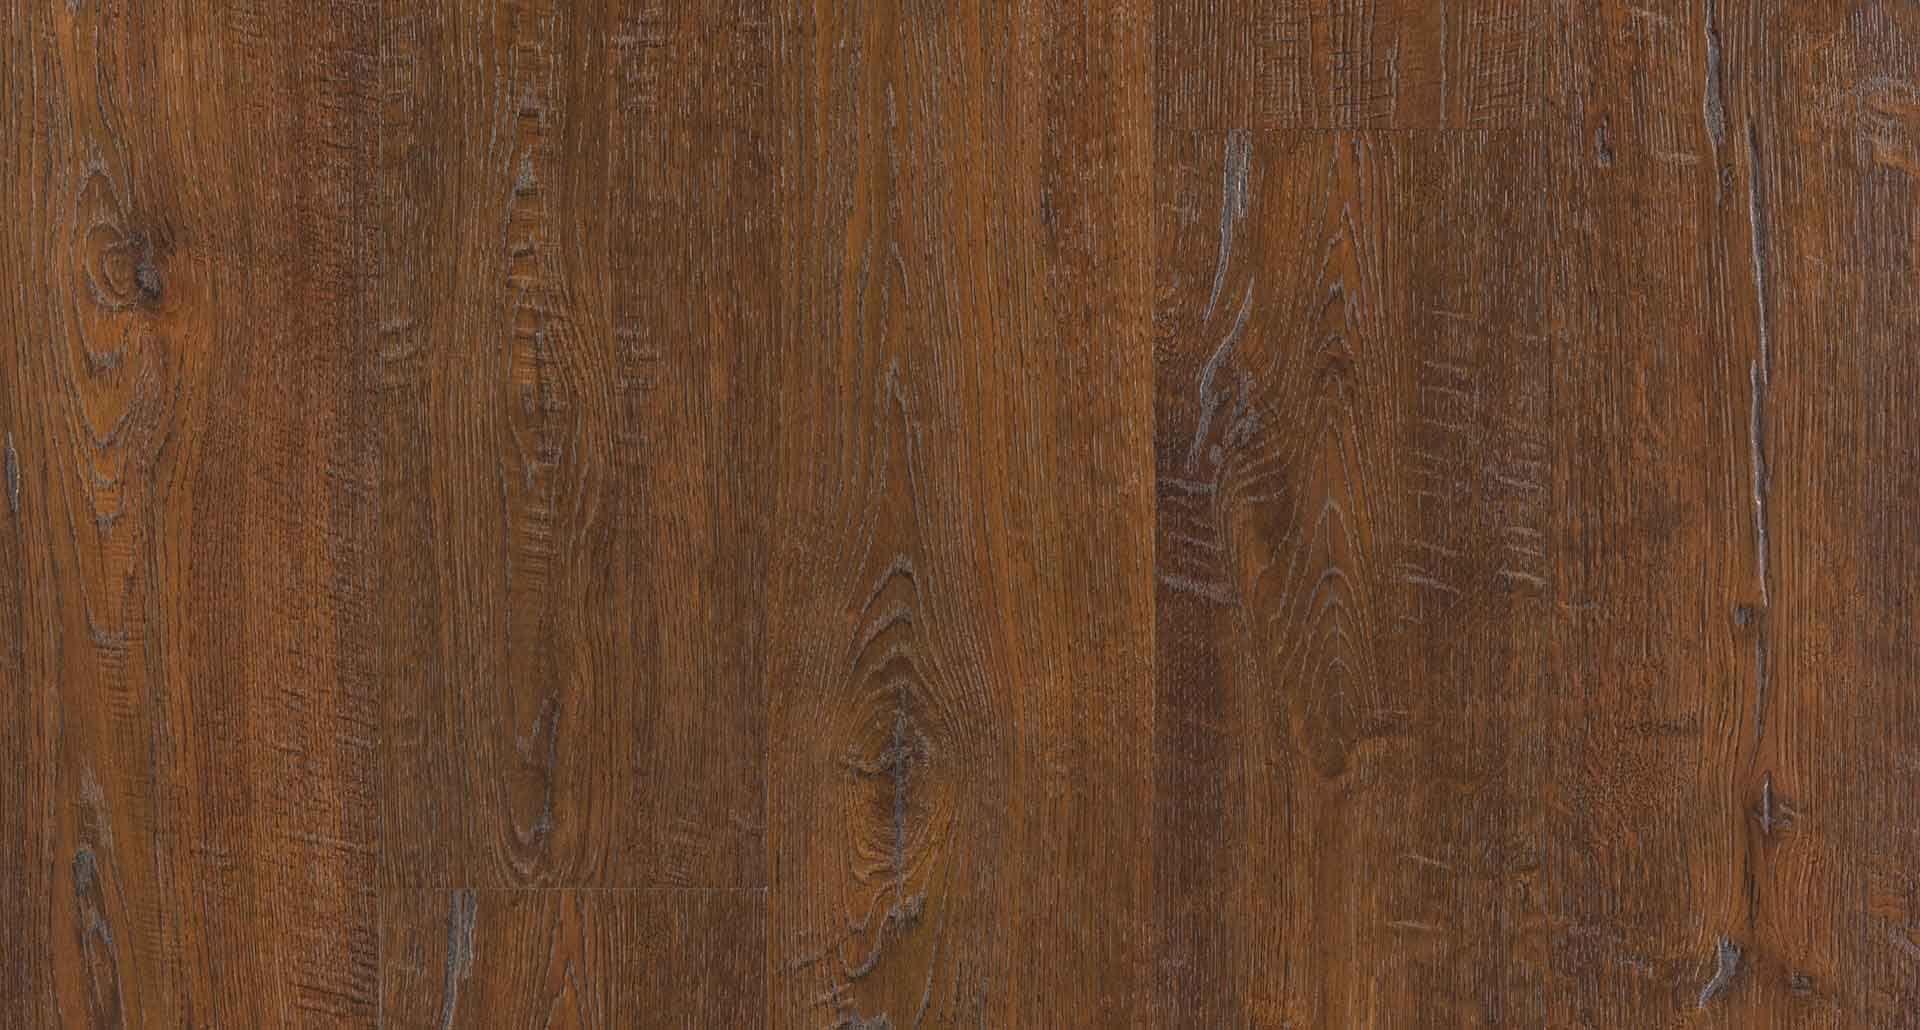 Auburn Scraped Oak Natural Laminate Floor With Wear And